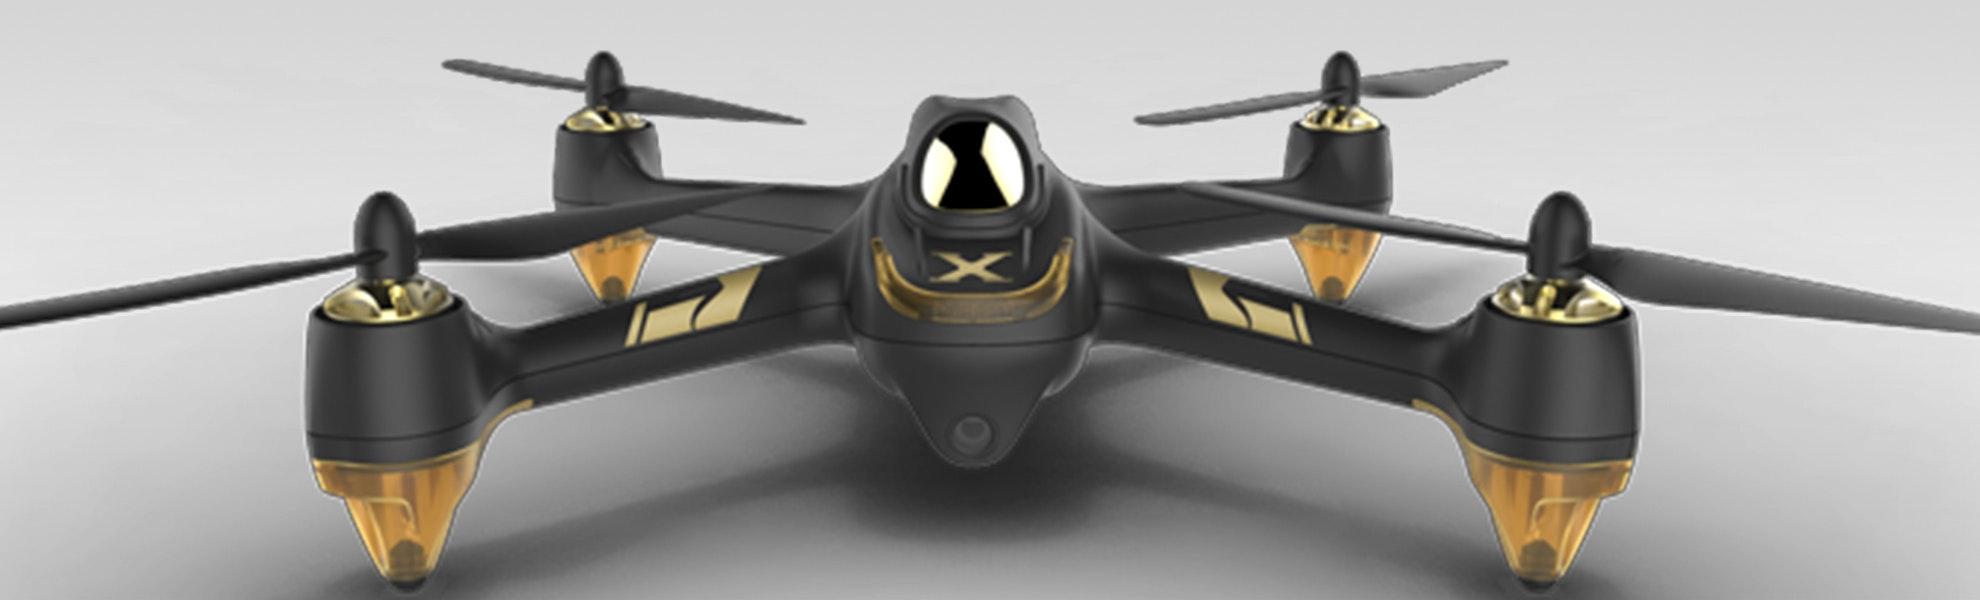 Hubsan H501A X4 Air Pro / H507A X4 Star Pro FPV